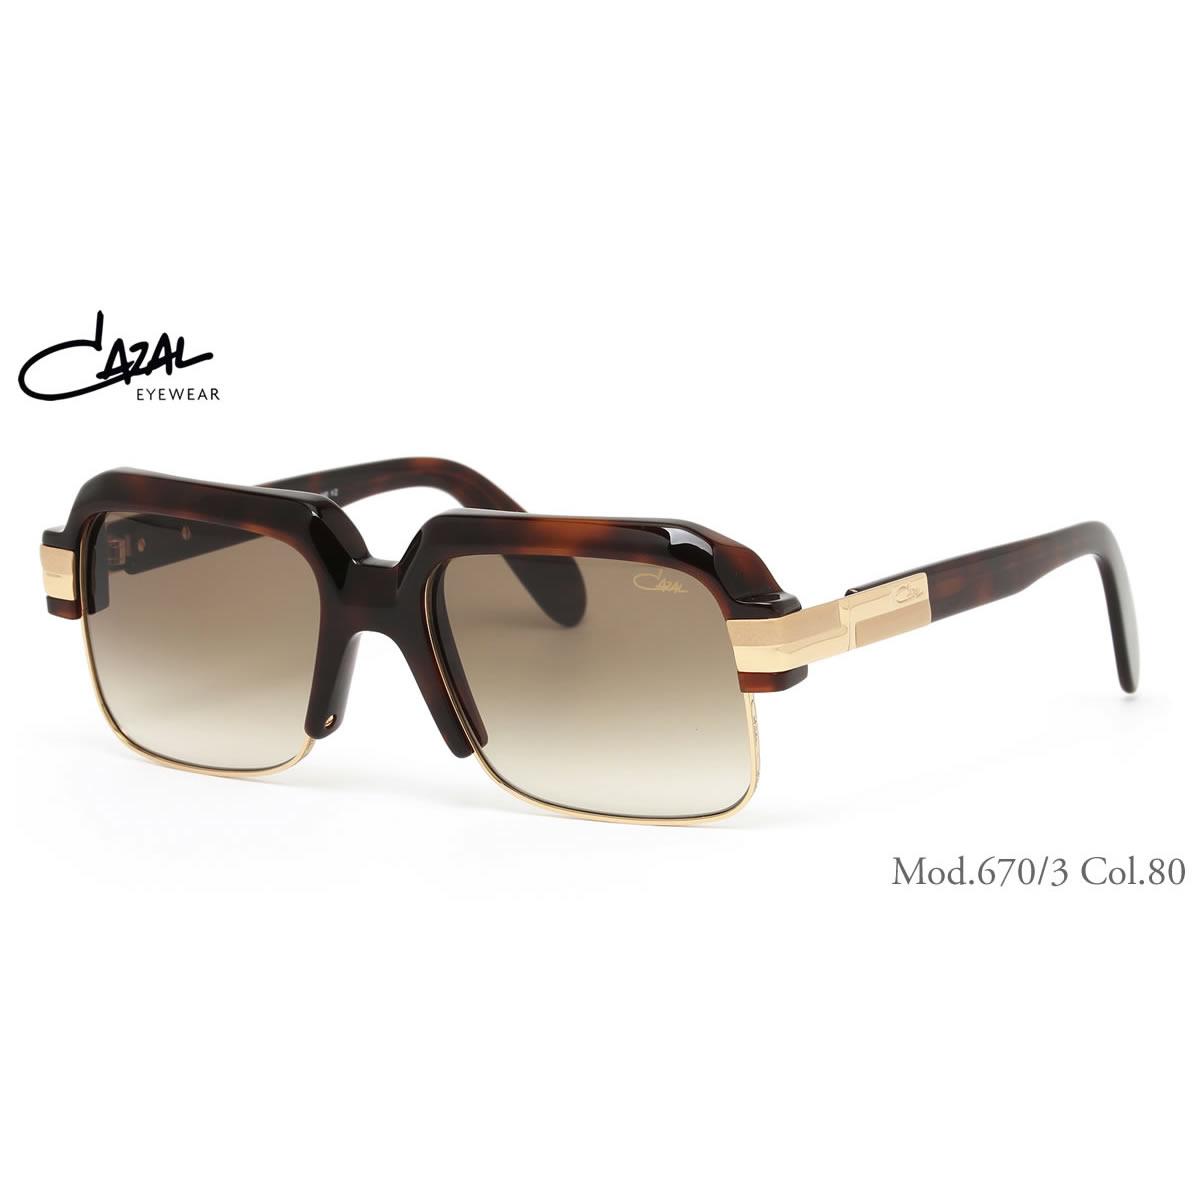 a172d5e1e6 (Casal) sunglasses legends 670   3 080 56 size legend CAZAL LEGENDS men s  women s